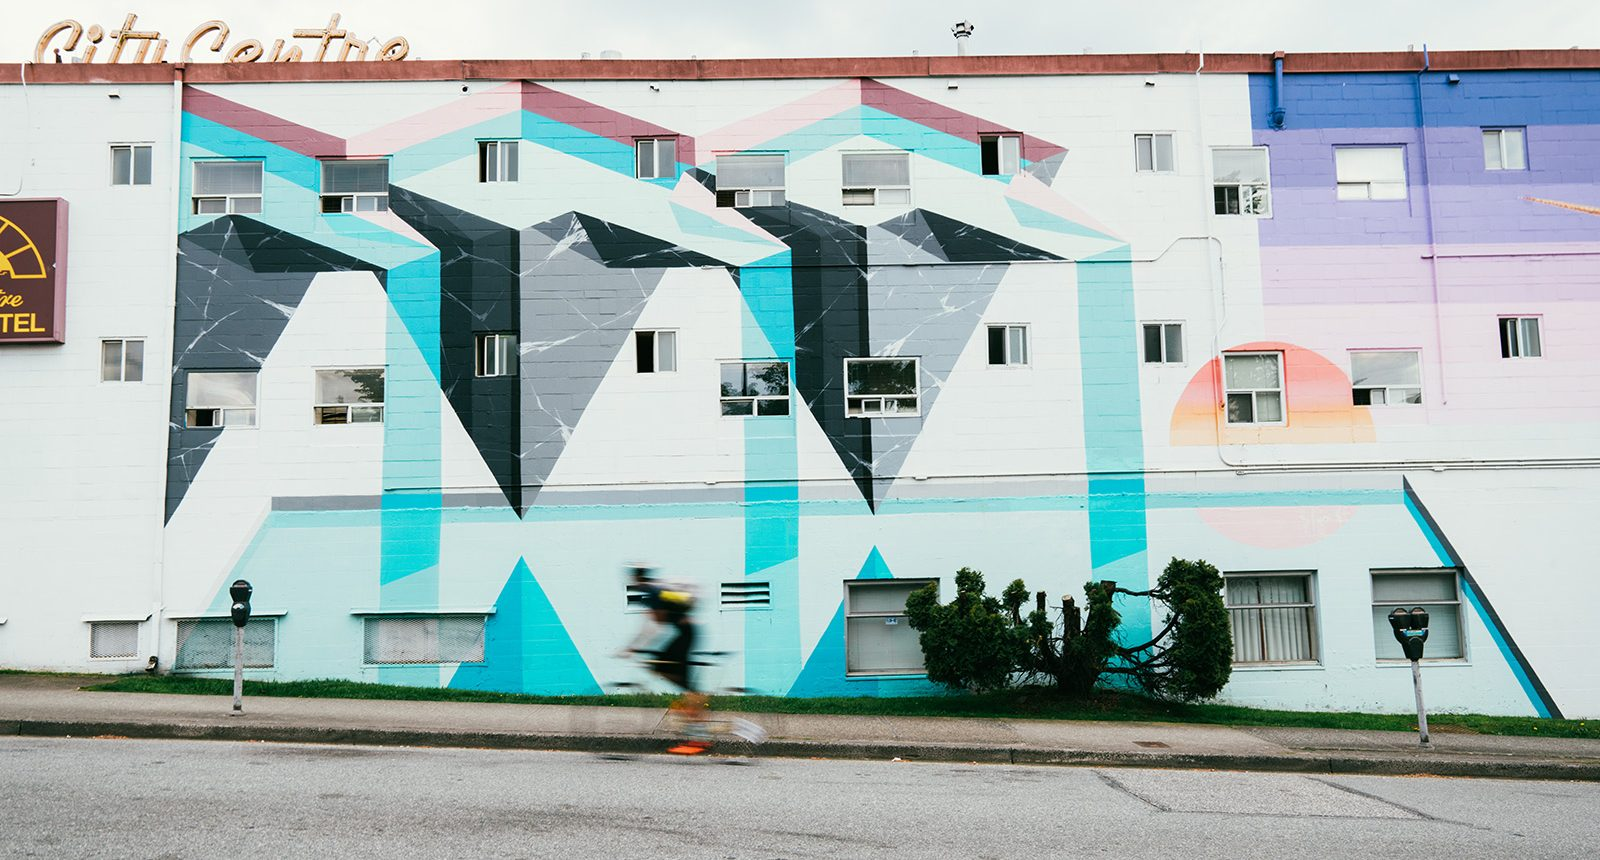 Main street building mural art